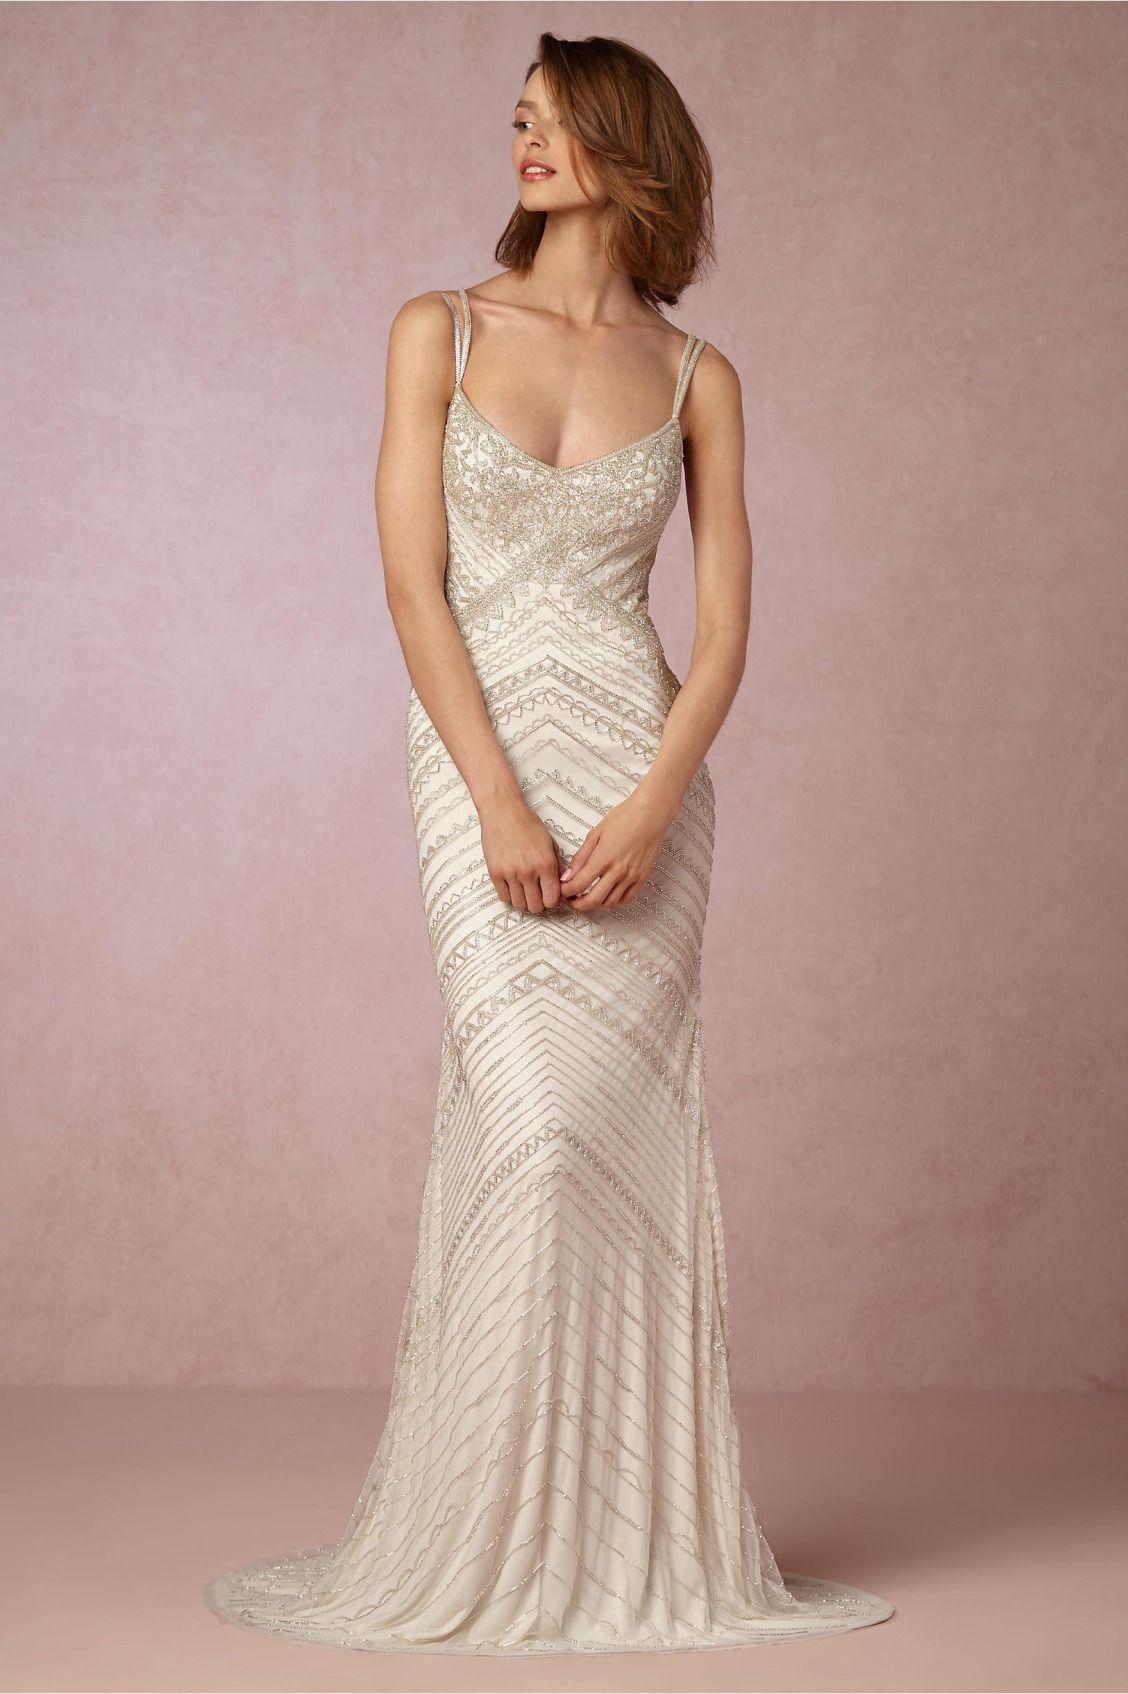 exquisite beadwork   Joslyn Gown from BHLDN   The Modern Bride ...